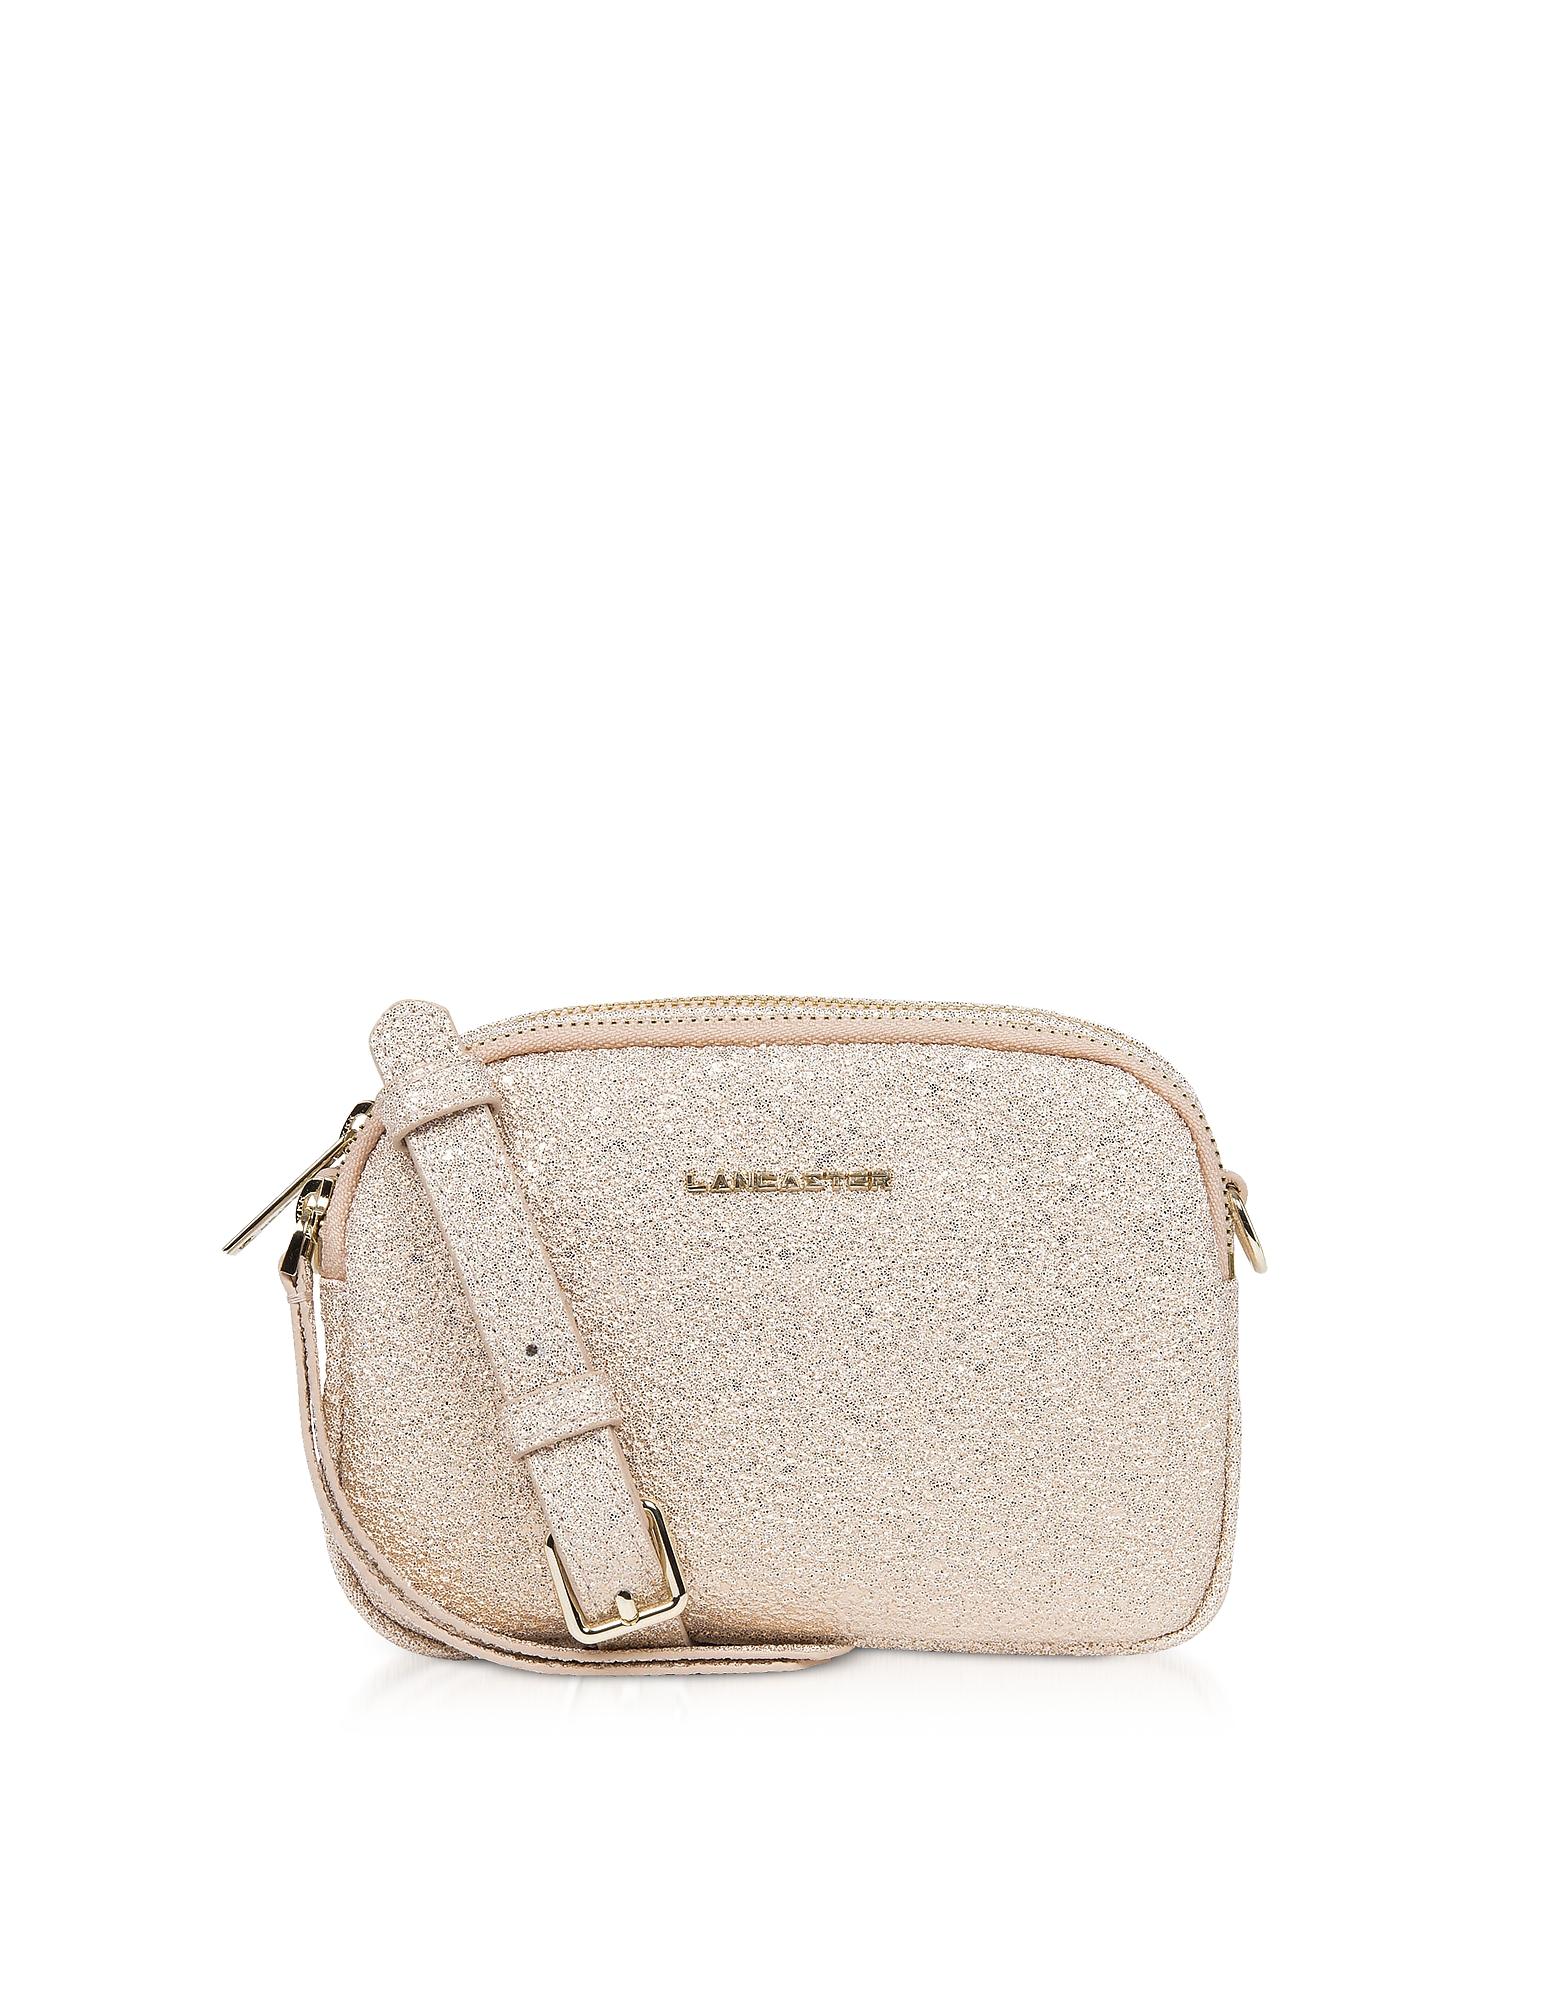 Lancaster Paris Handbags, Actual Shiny Mini Crossbody Bag